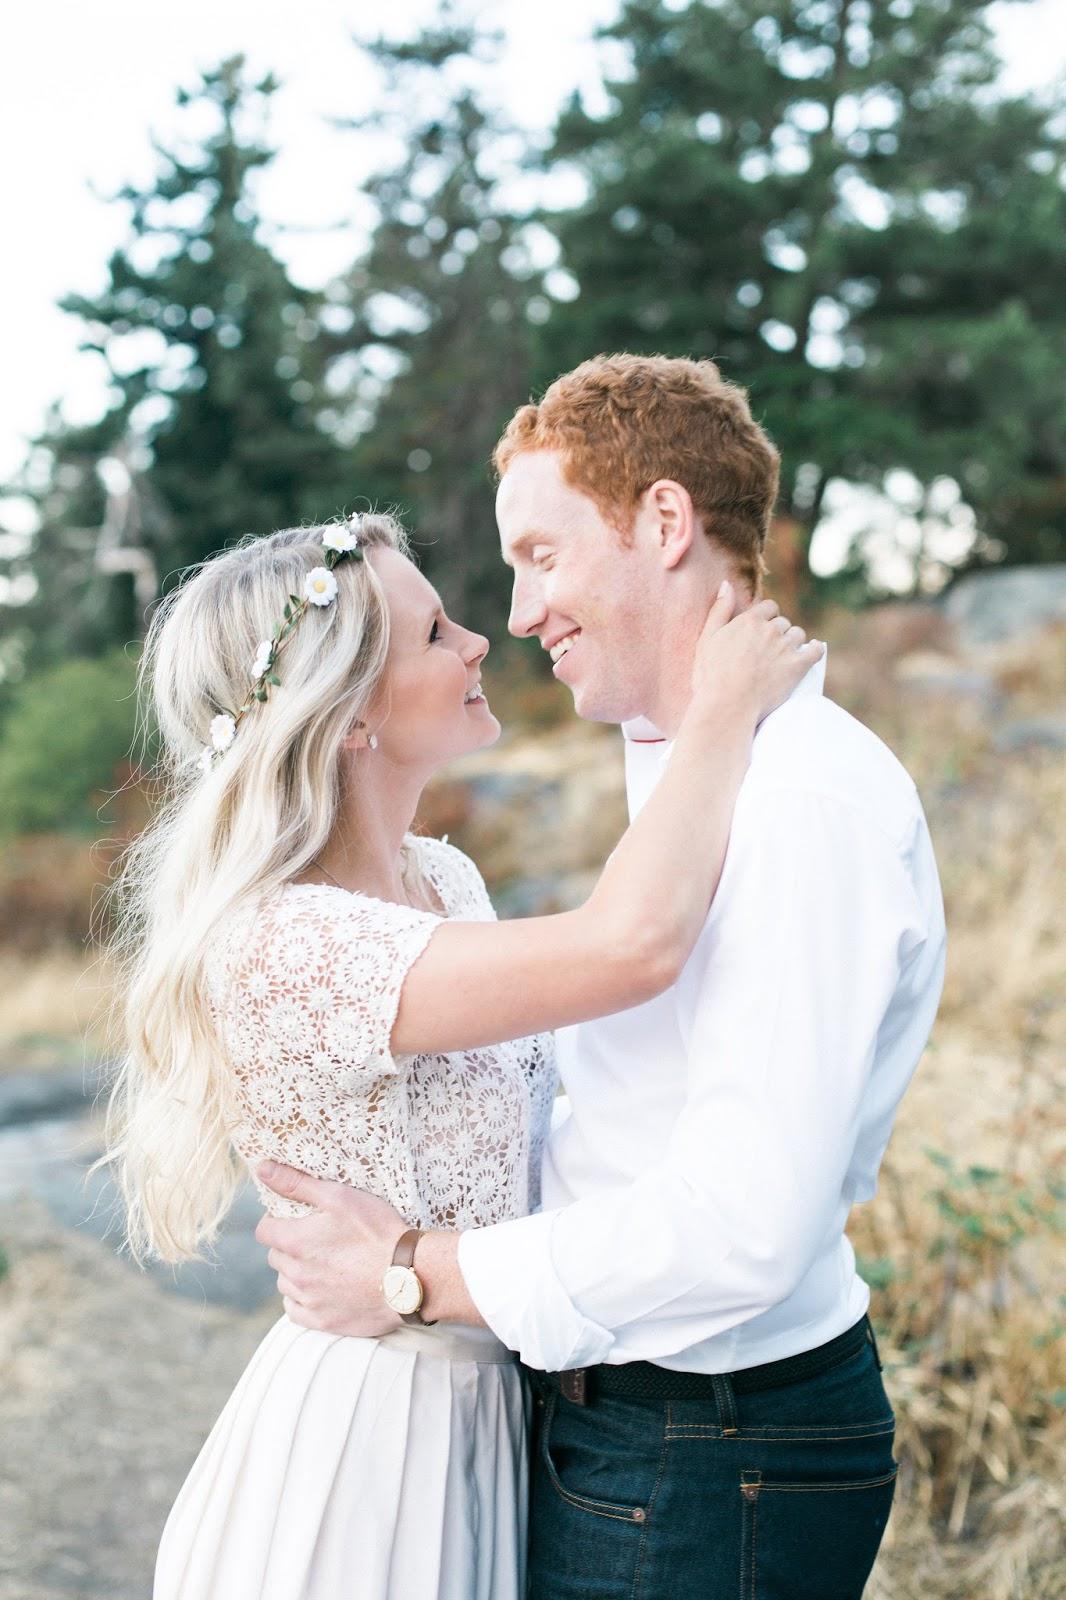 boho themed wedding photography and engagement session